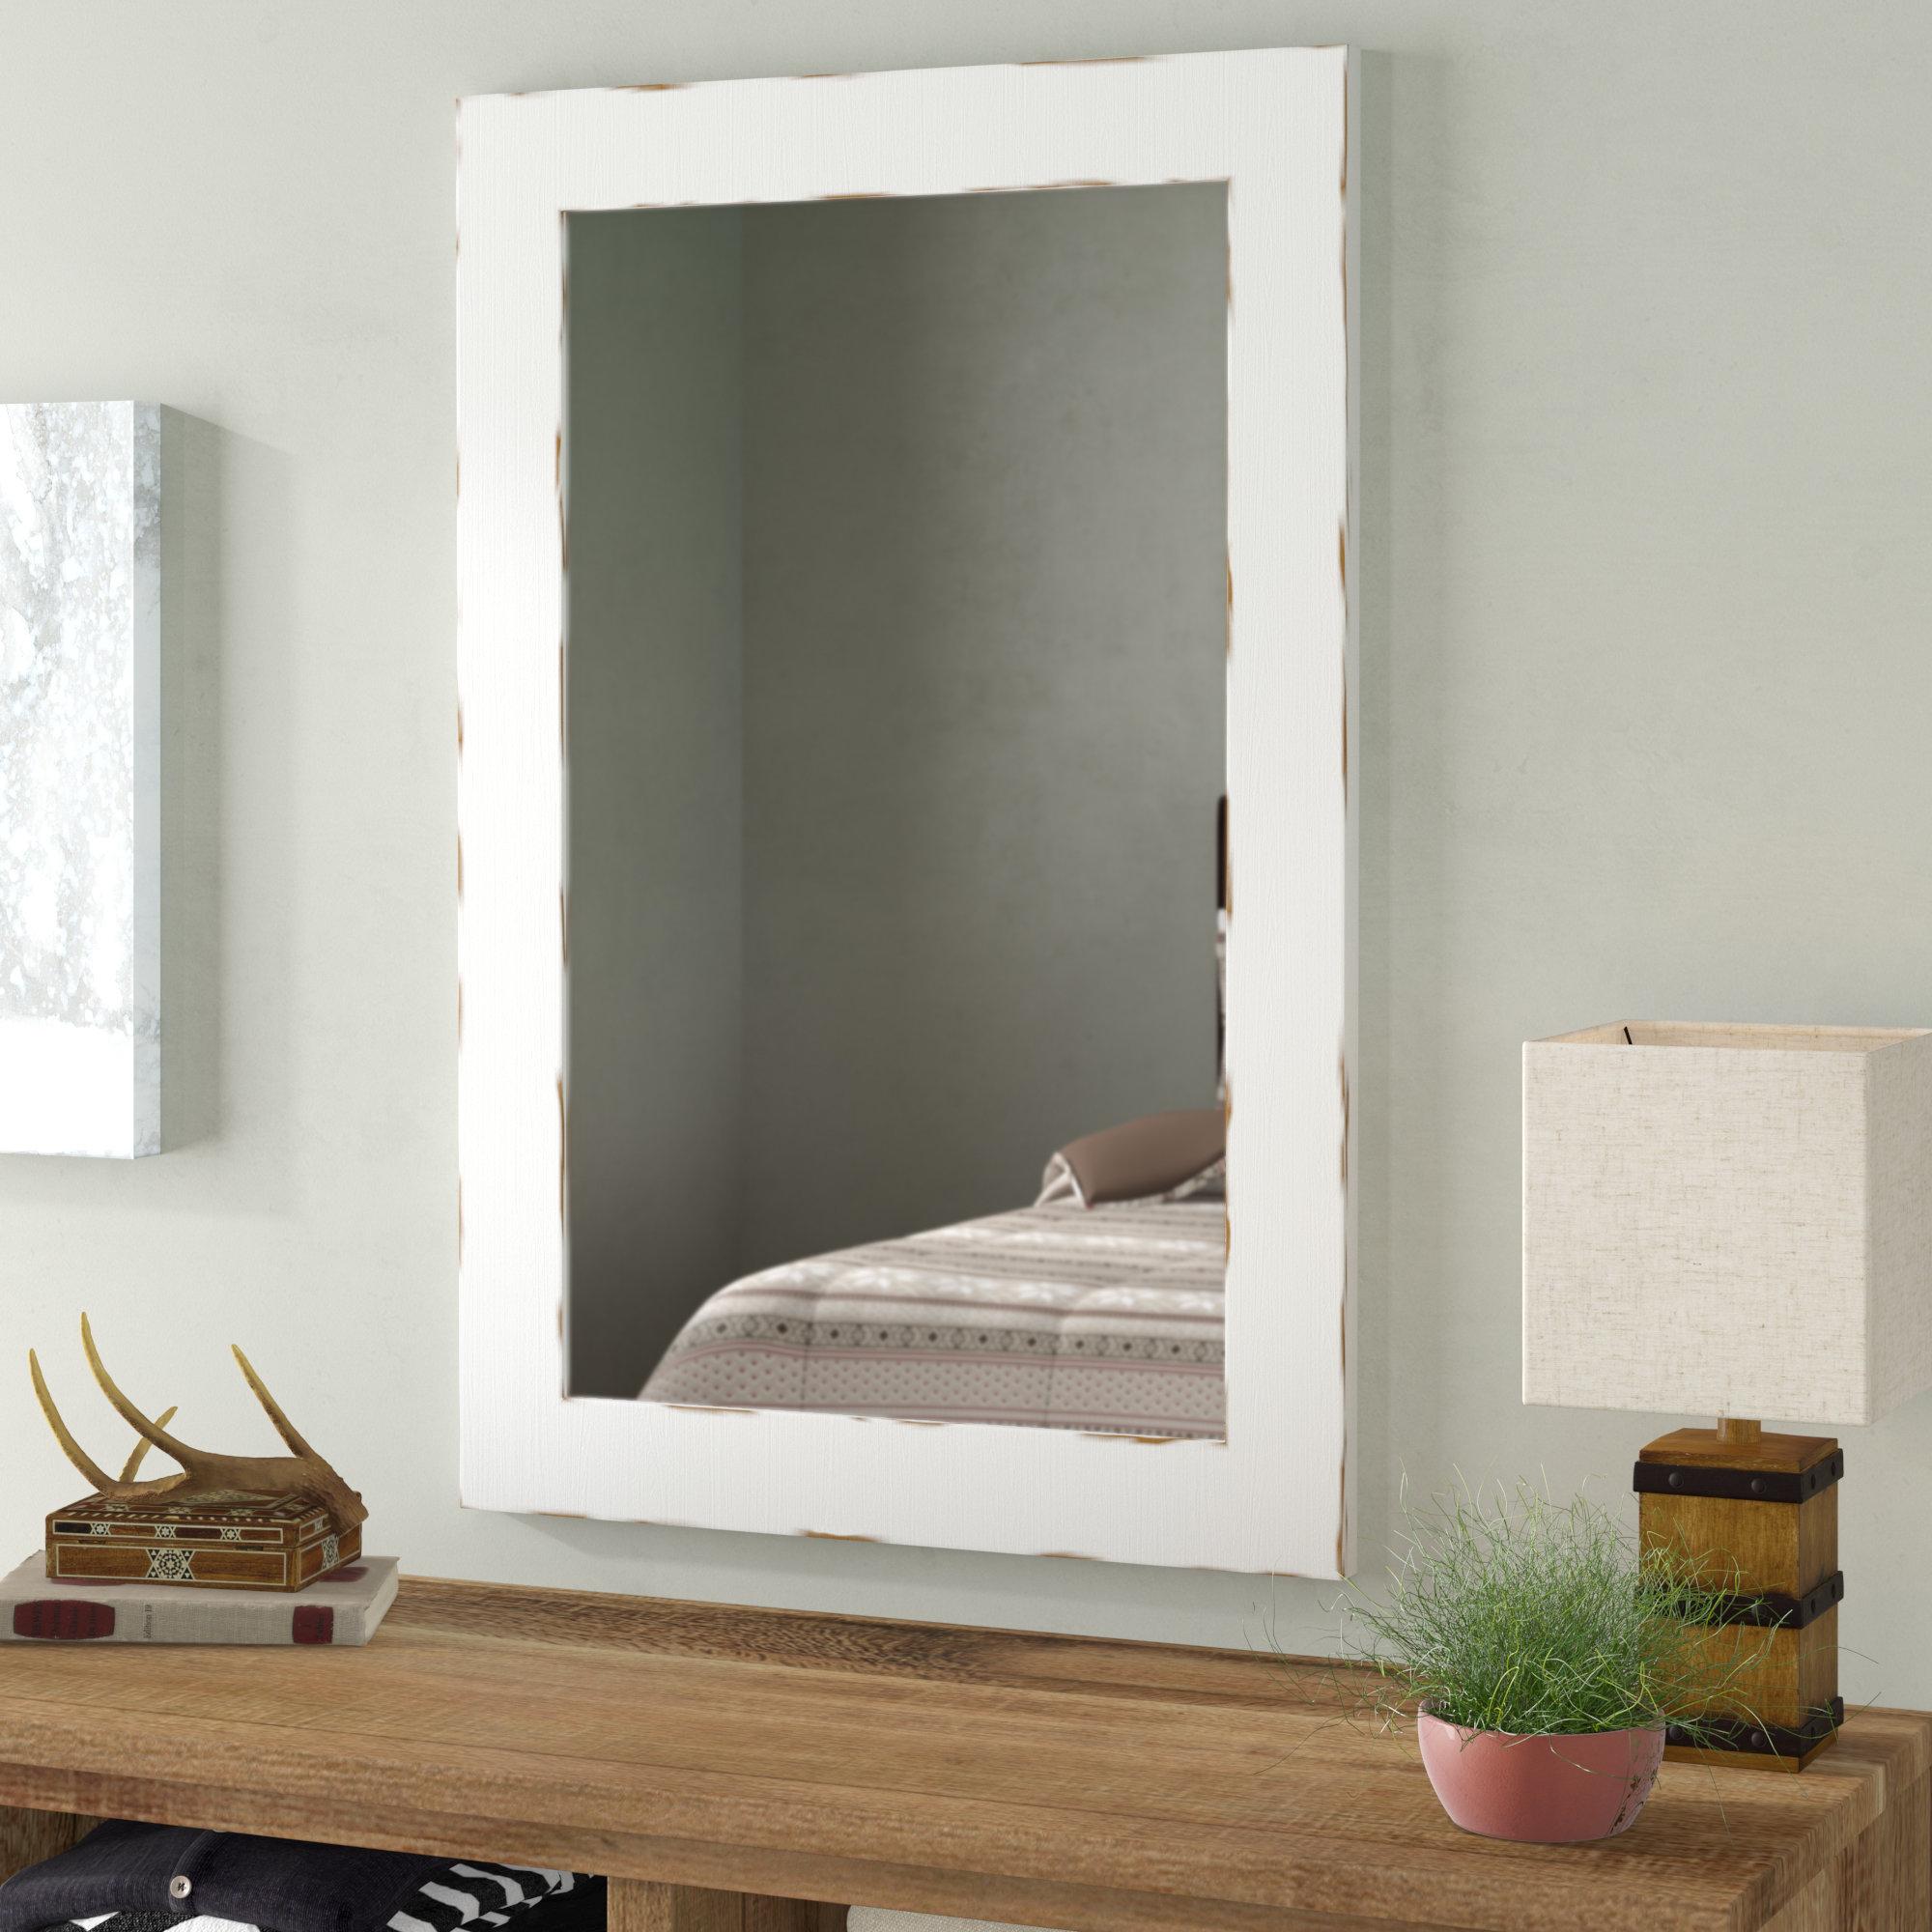 Shabby Rustic Mirror   Wayfair Regarding Epinal Shabby Elegance Wall Mirrors (View 13 of 20)